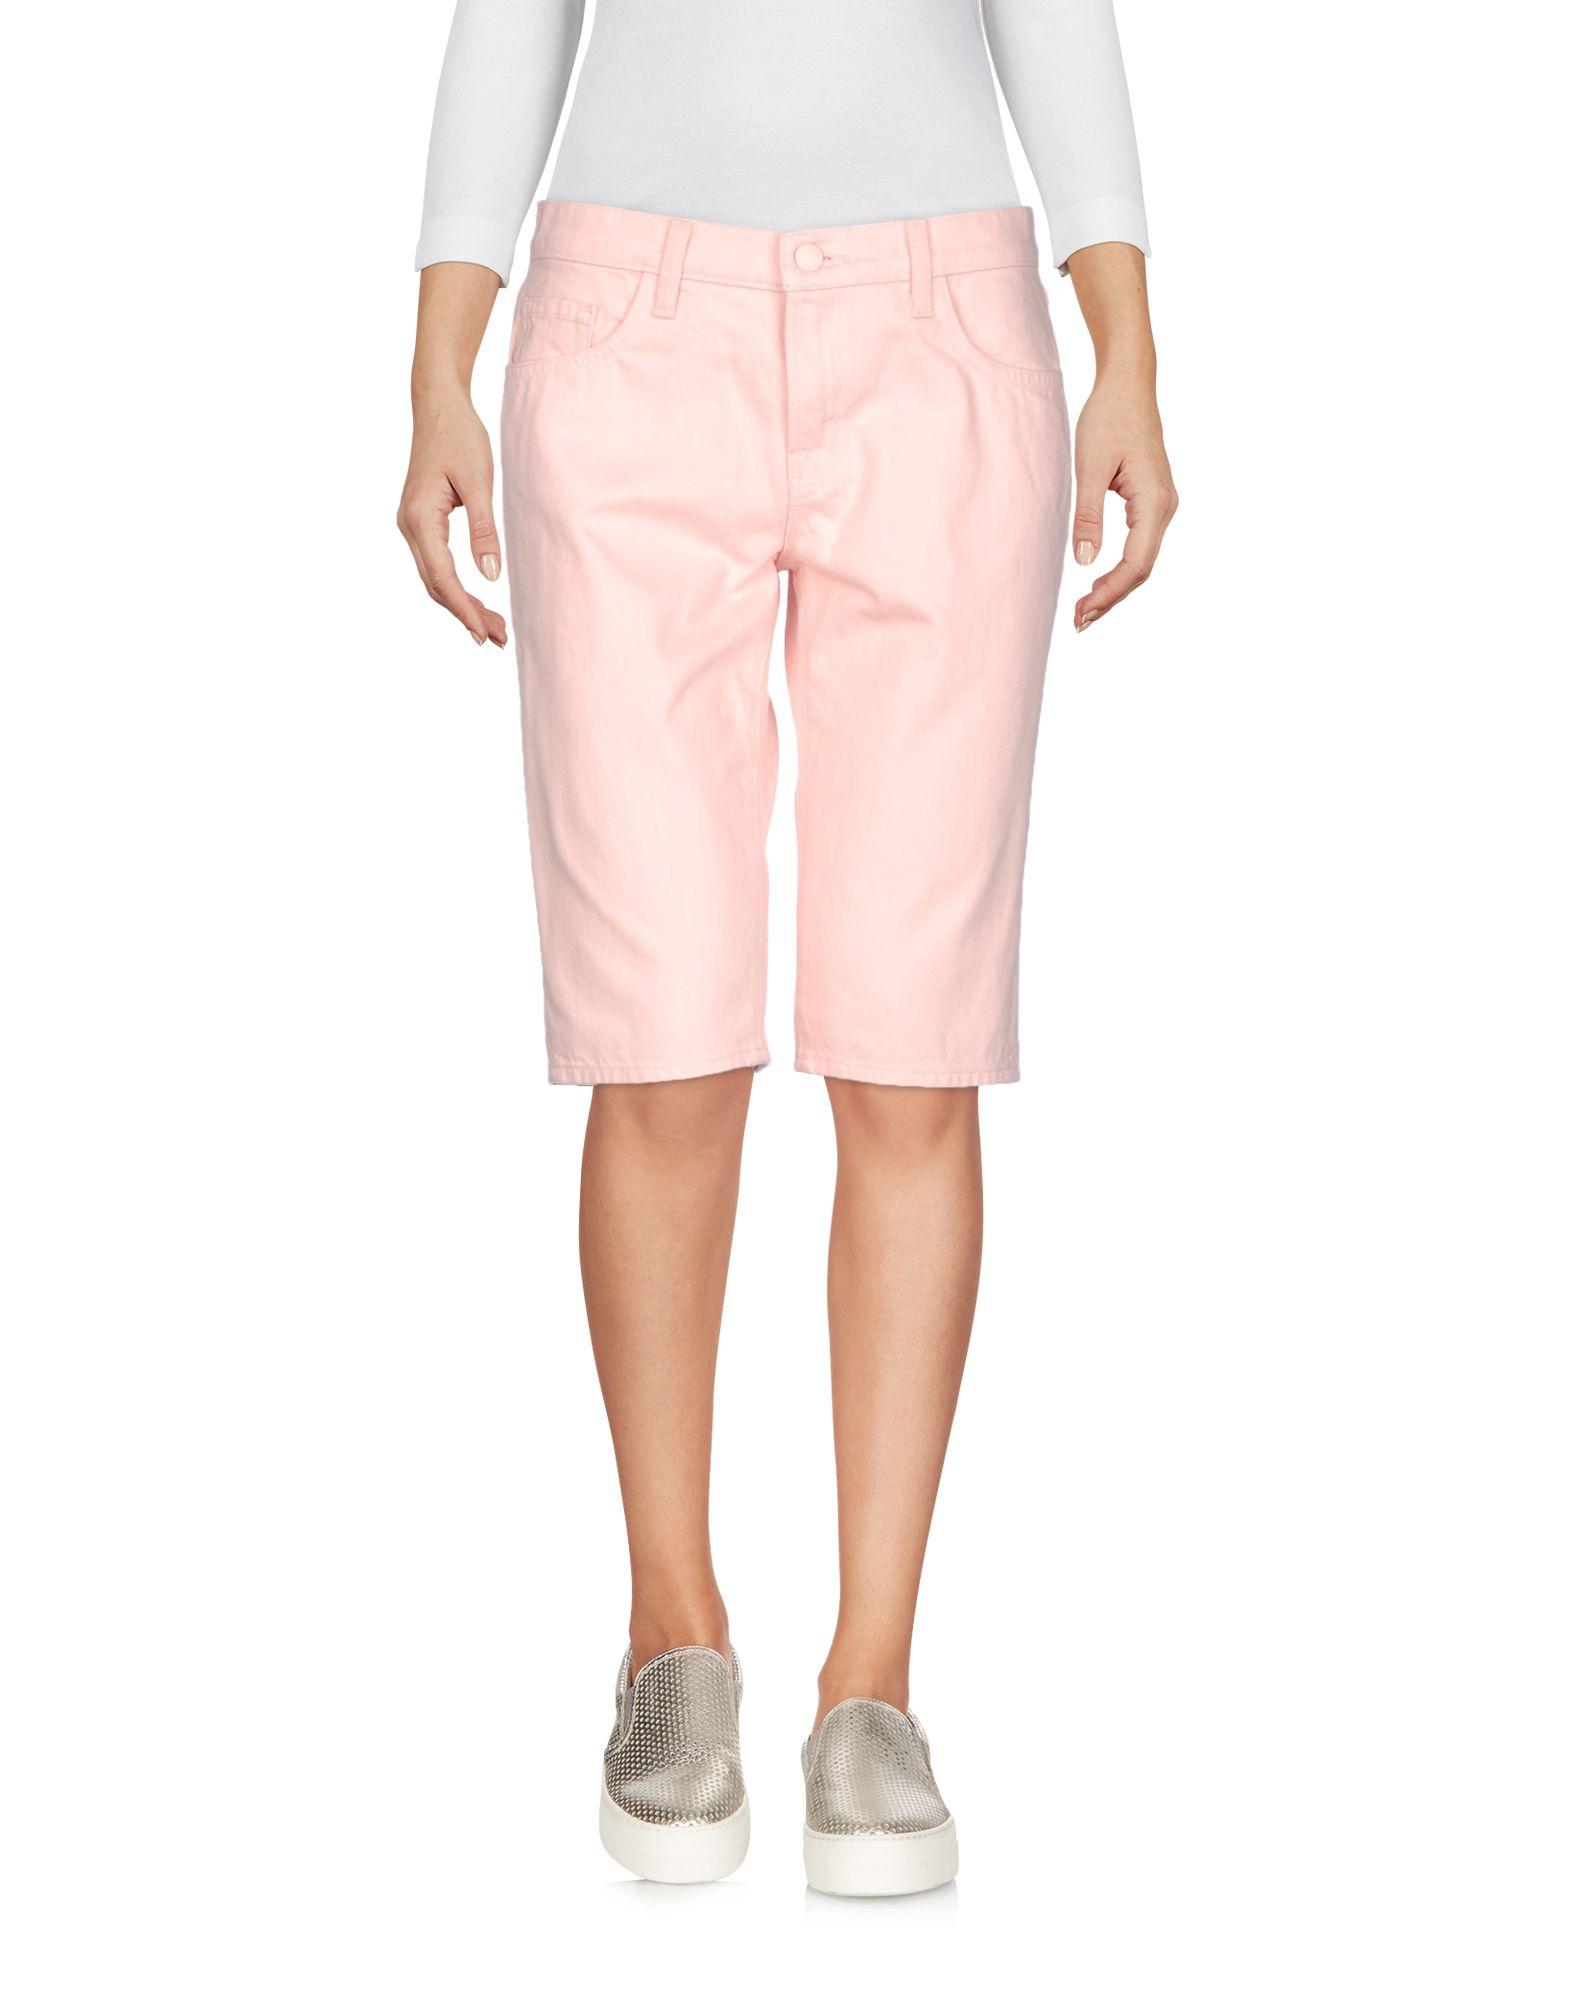 SIMONE ROCHA X J BRAND Denim Shorts in Pink